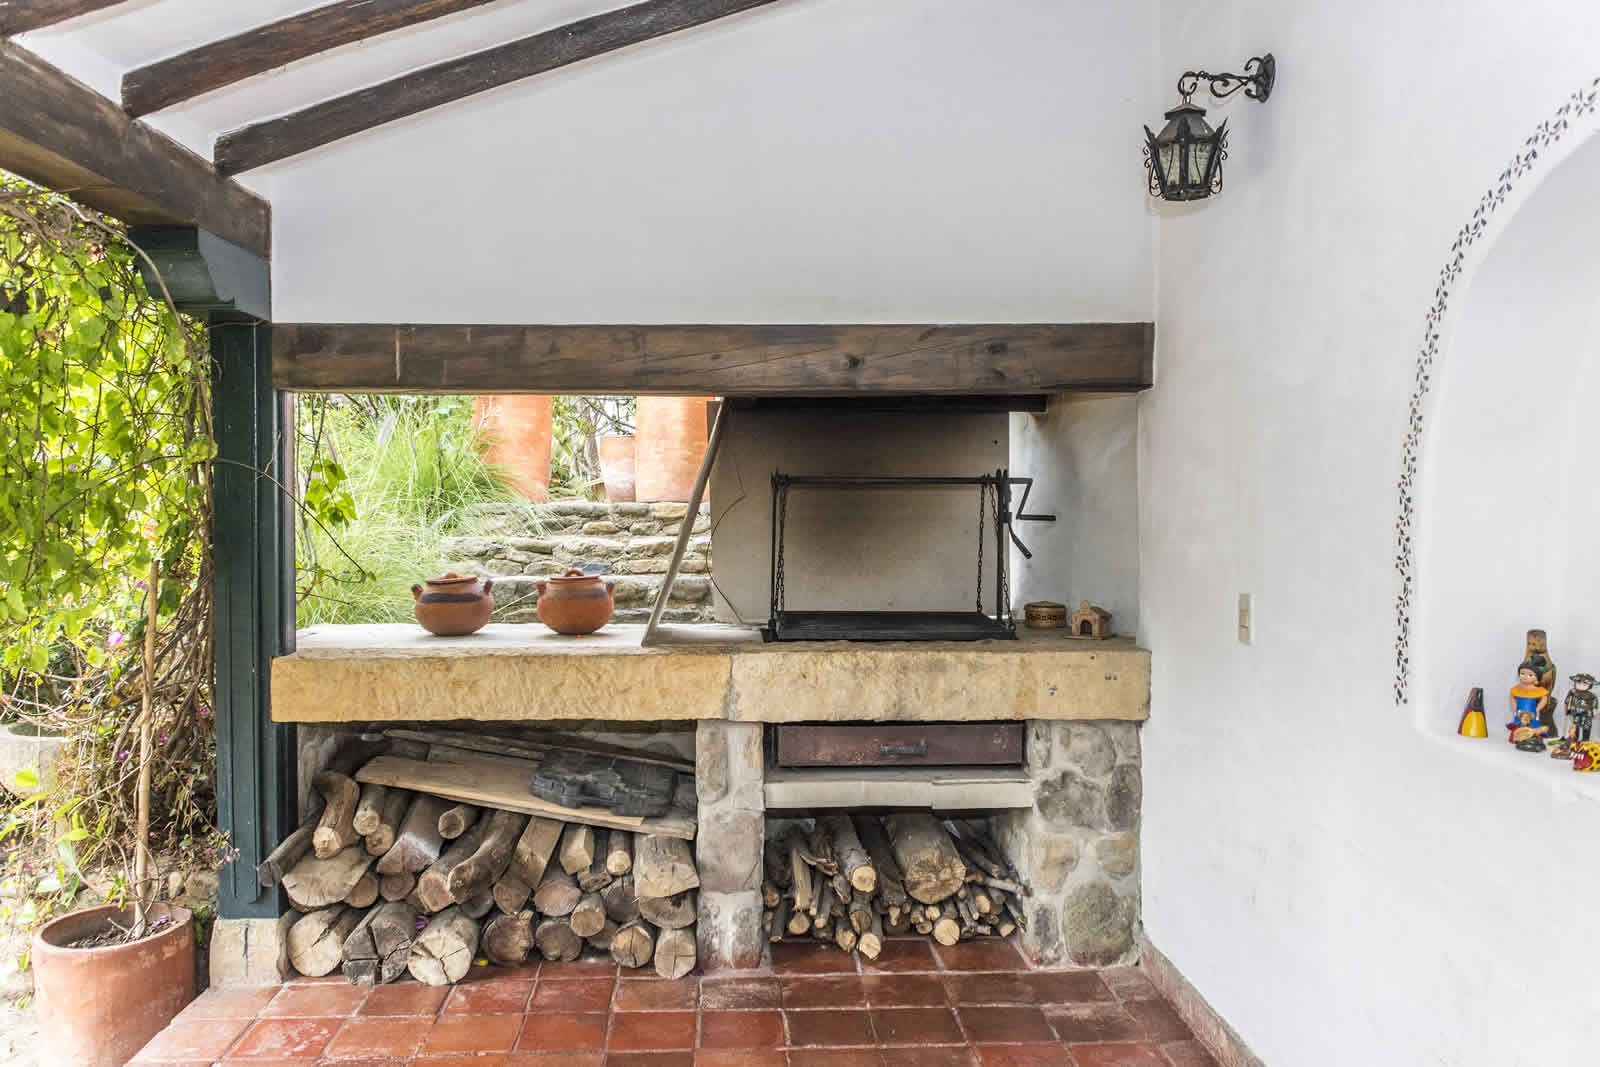 BBQ Shonsua Villa de Leyva